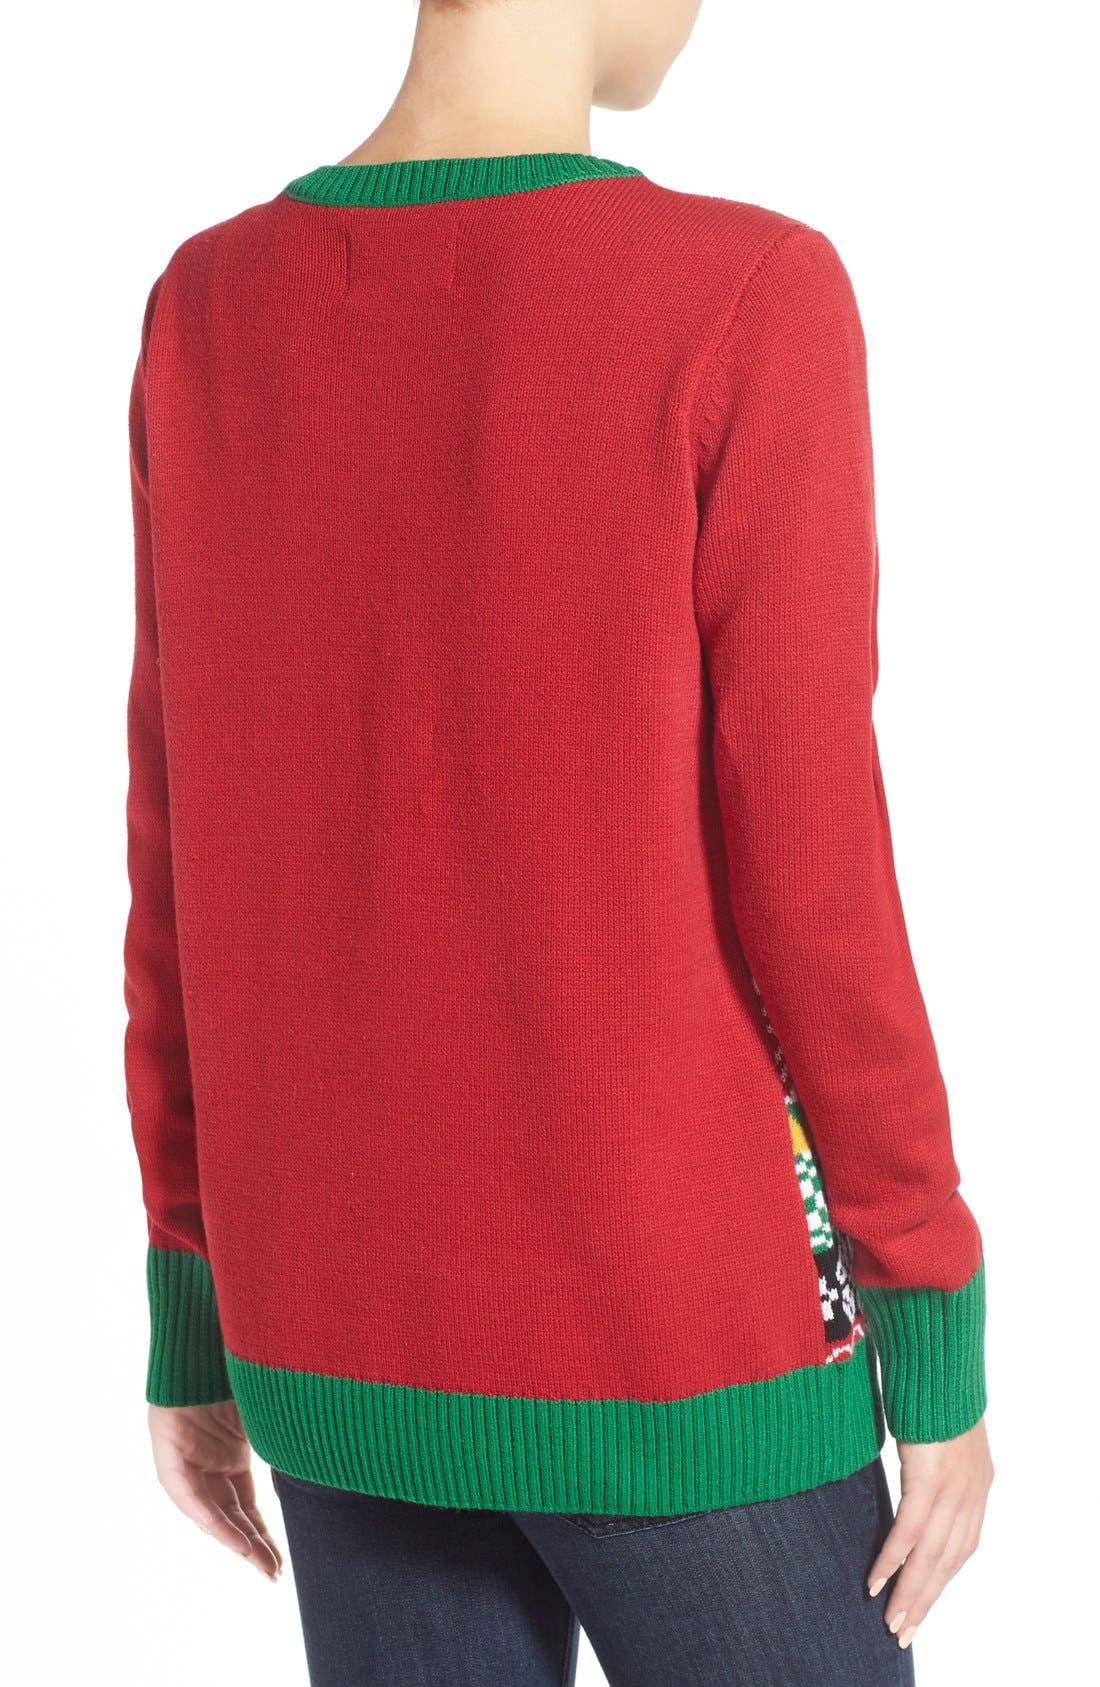 Alternate Image 2  - Ugly Christmas Sweater 'Penguin' Light-Up Fair Isle Knit Sweater